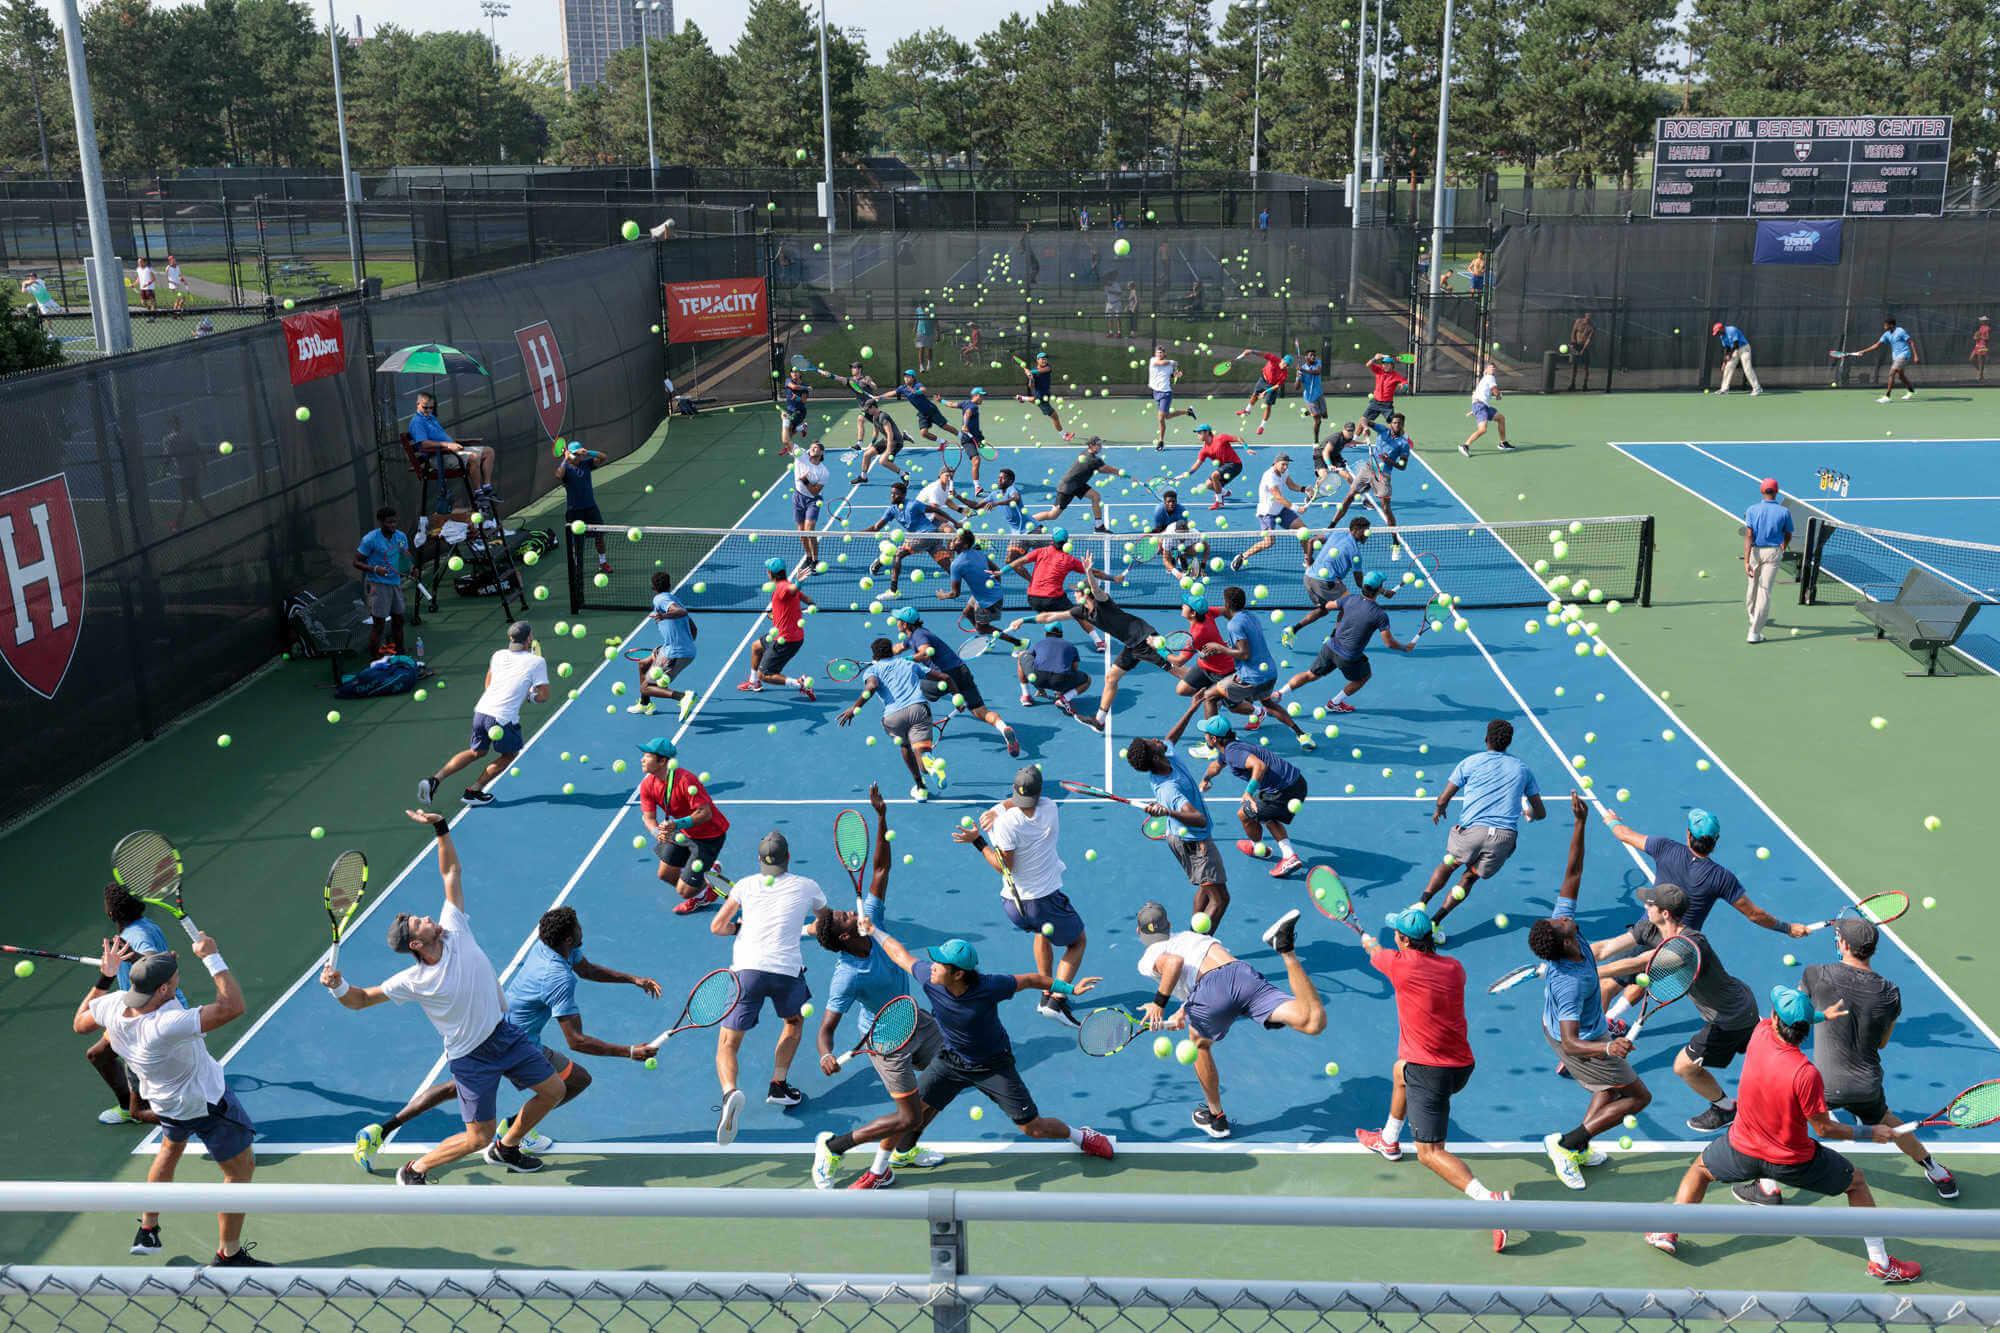 Tenis time lapse fotografia